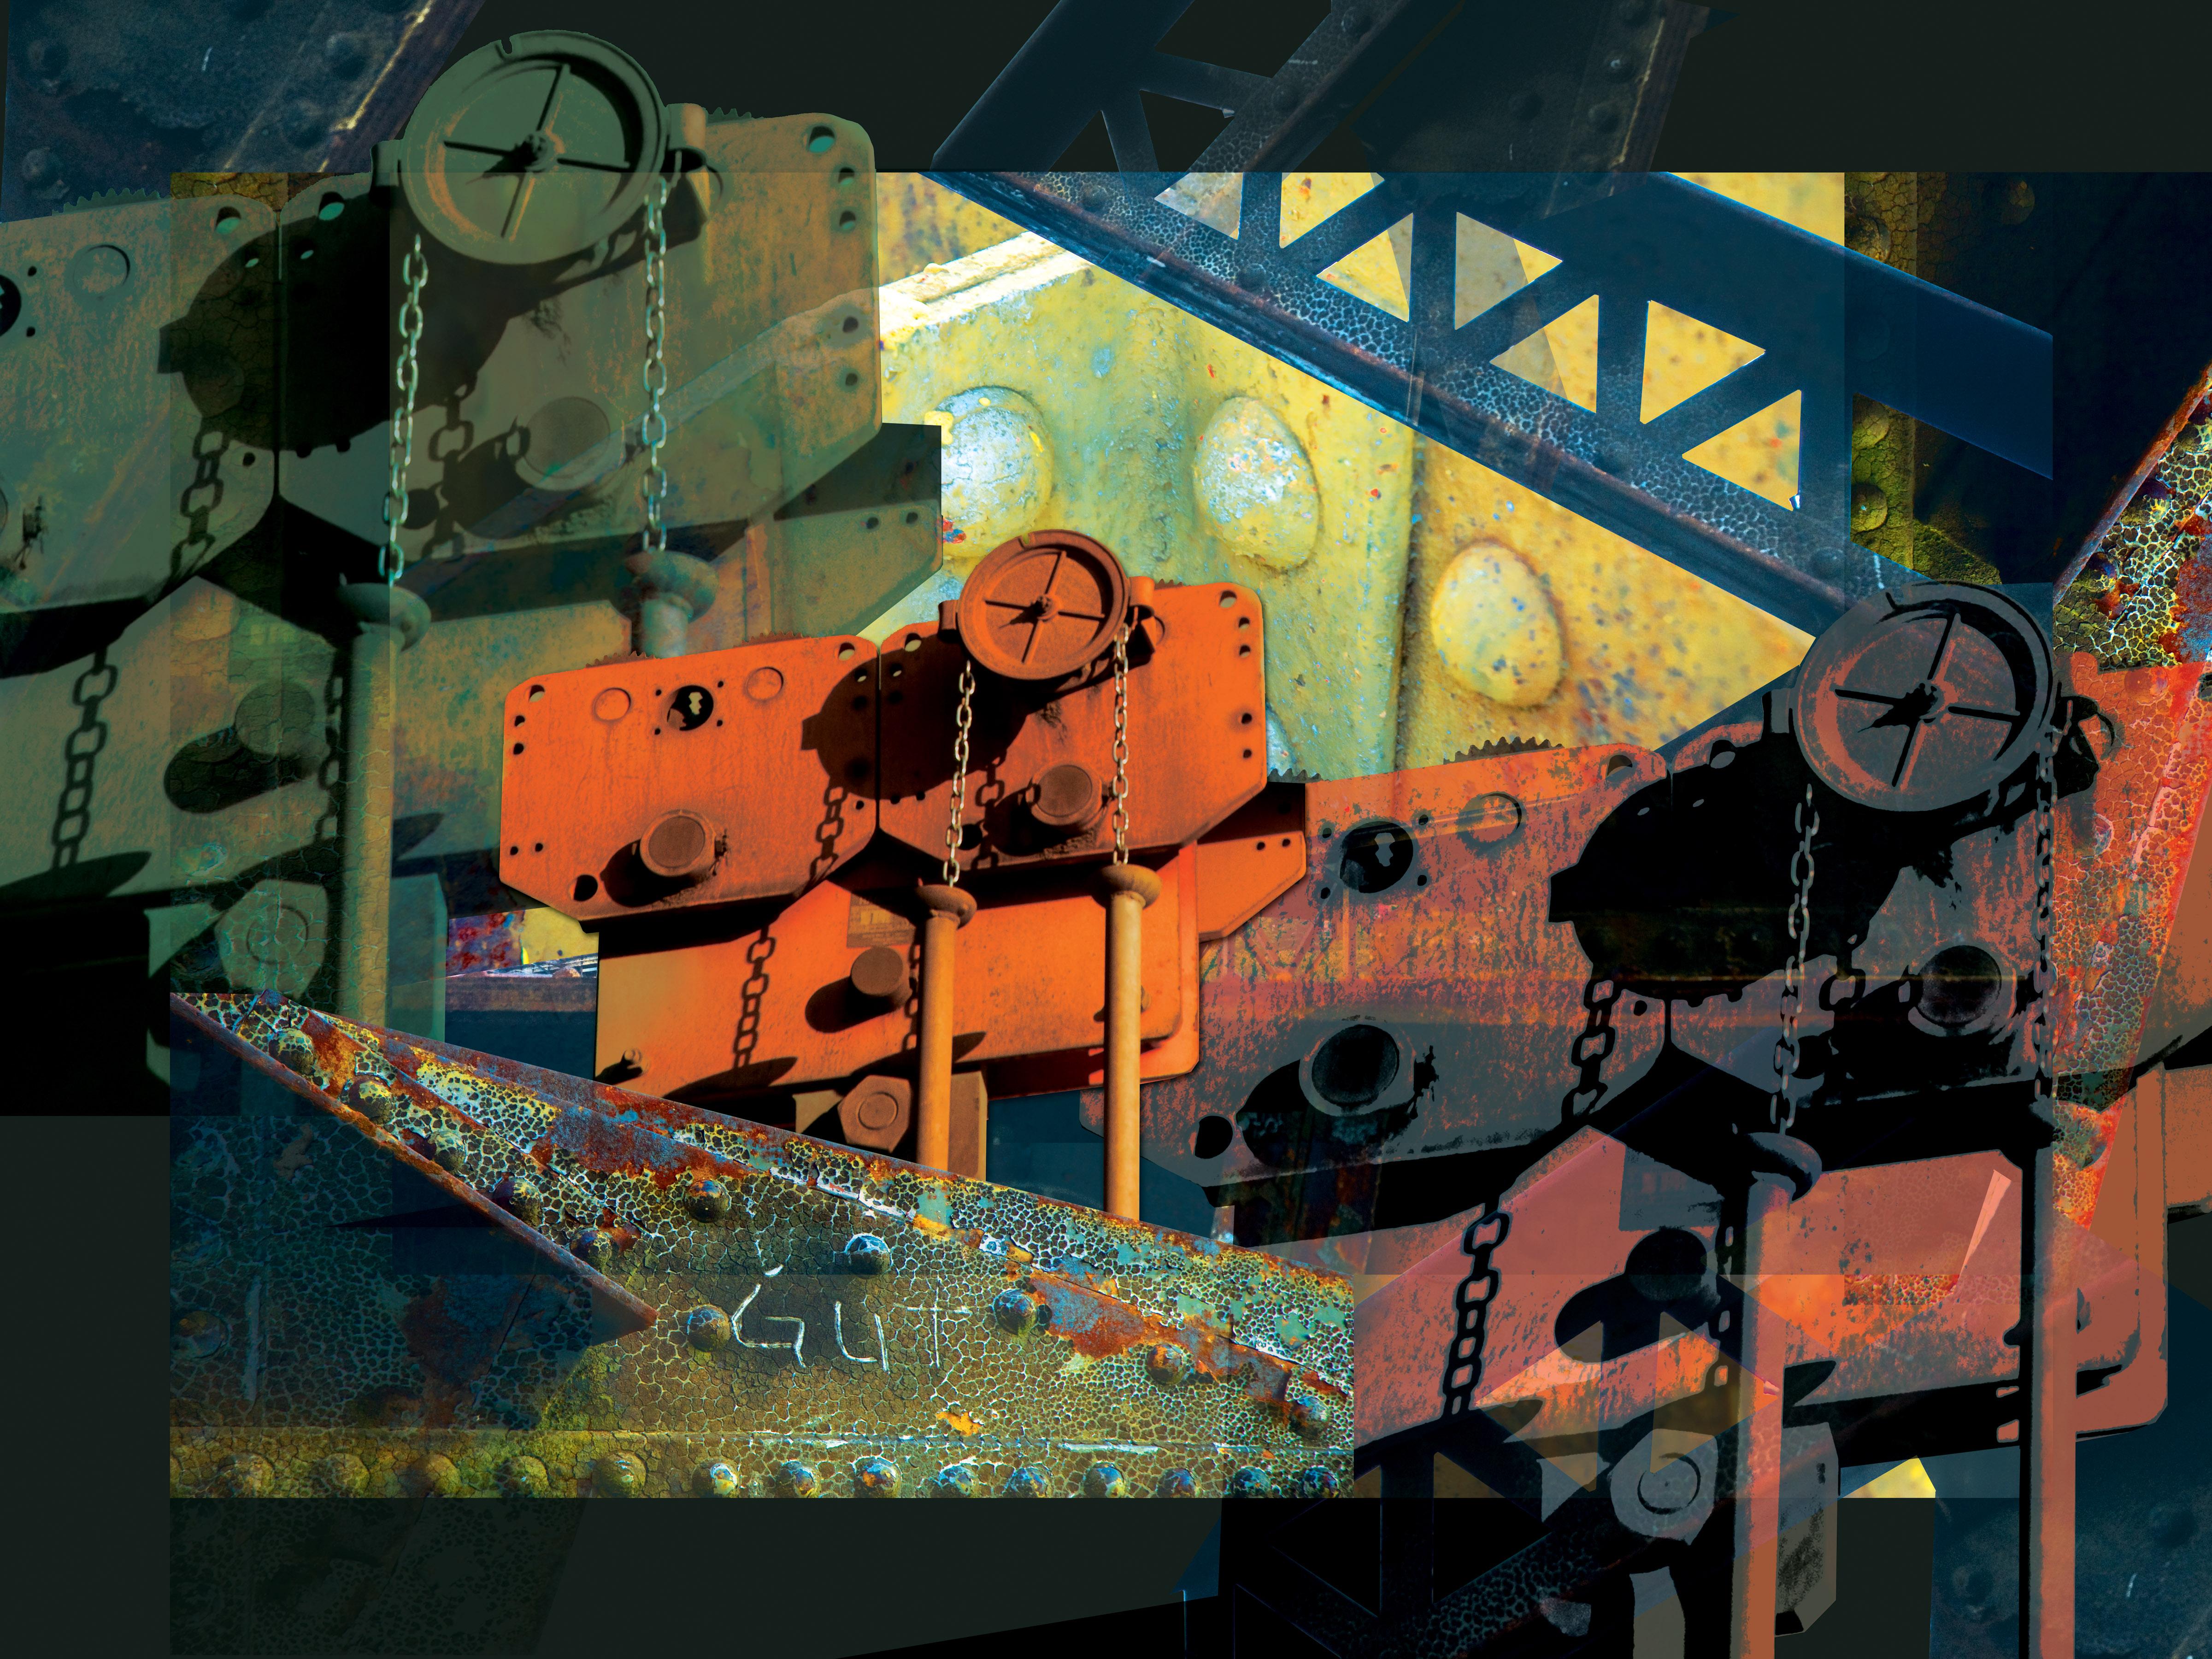 Train_1_Aug08